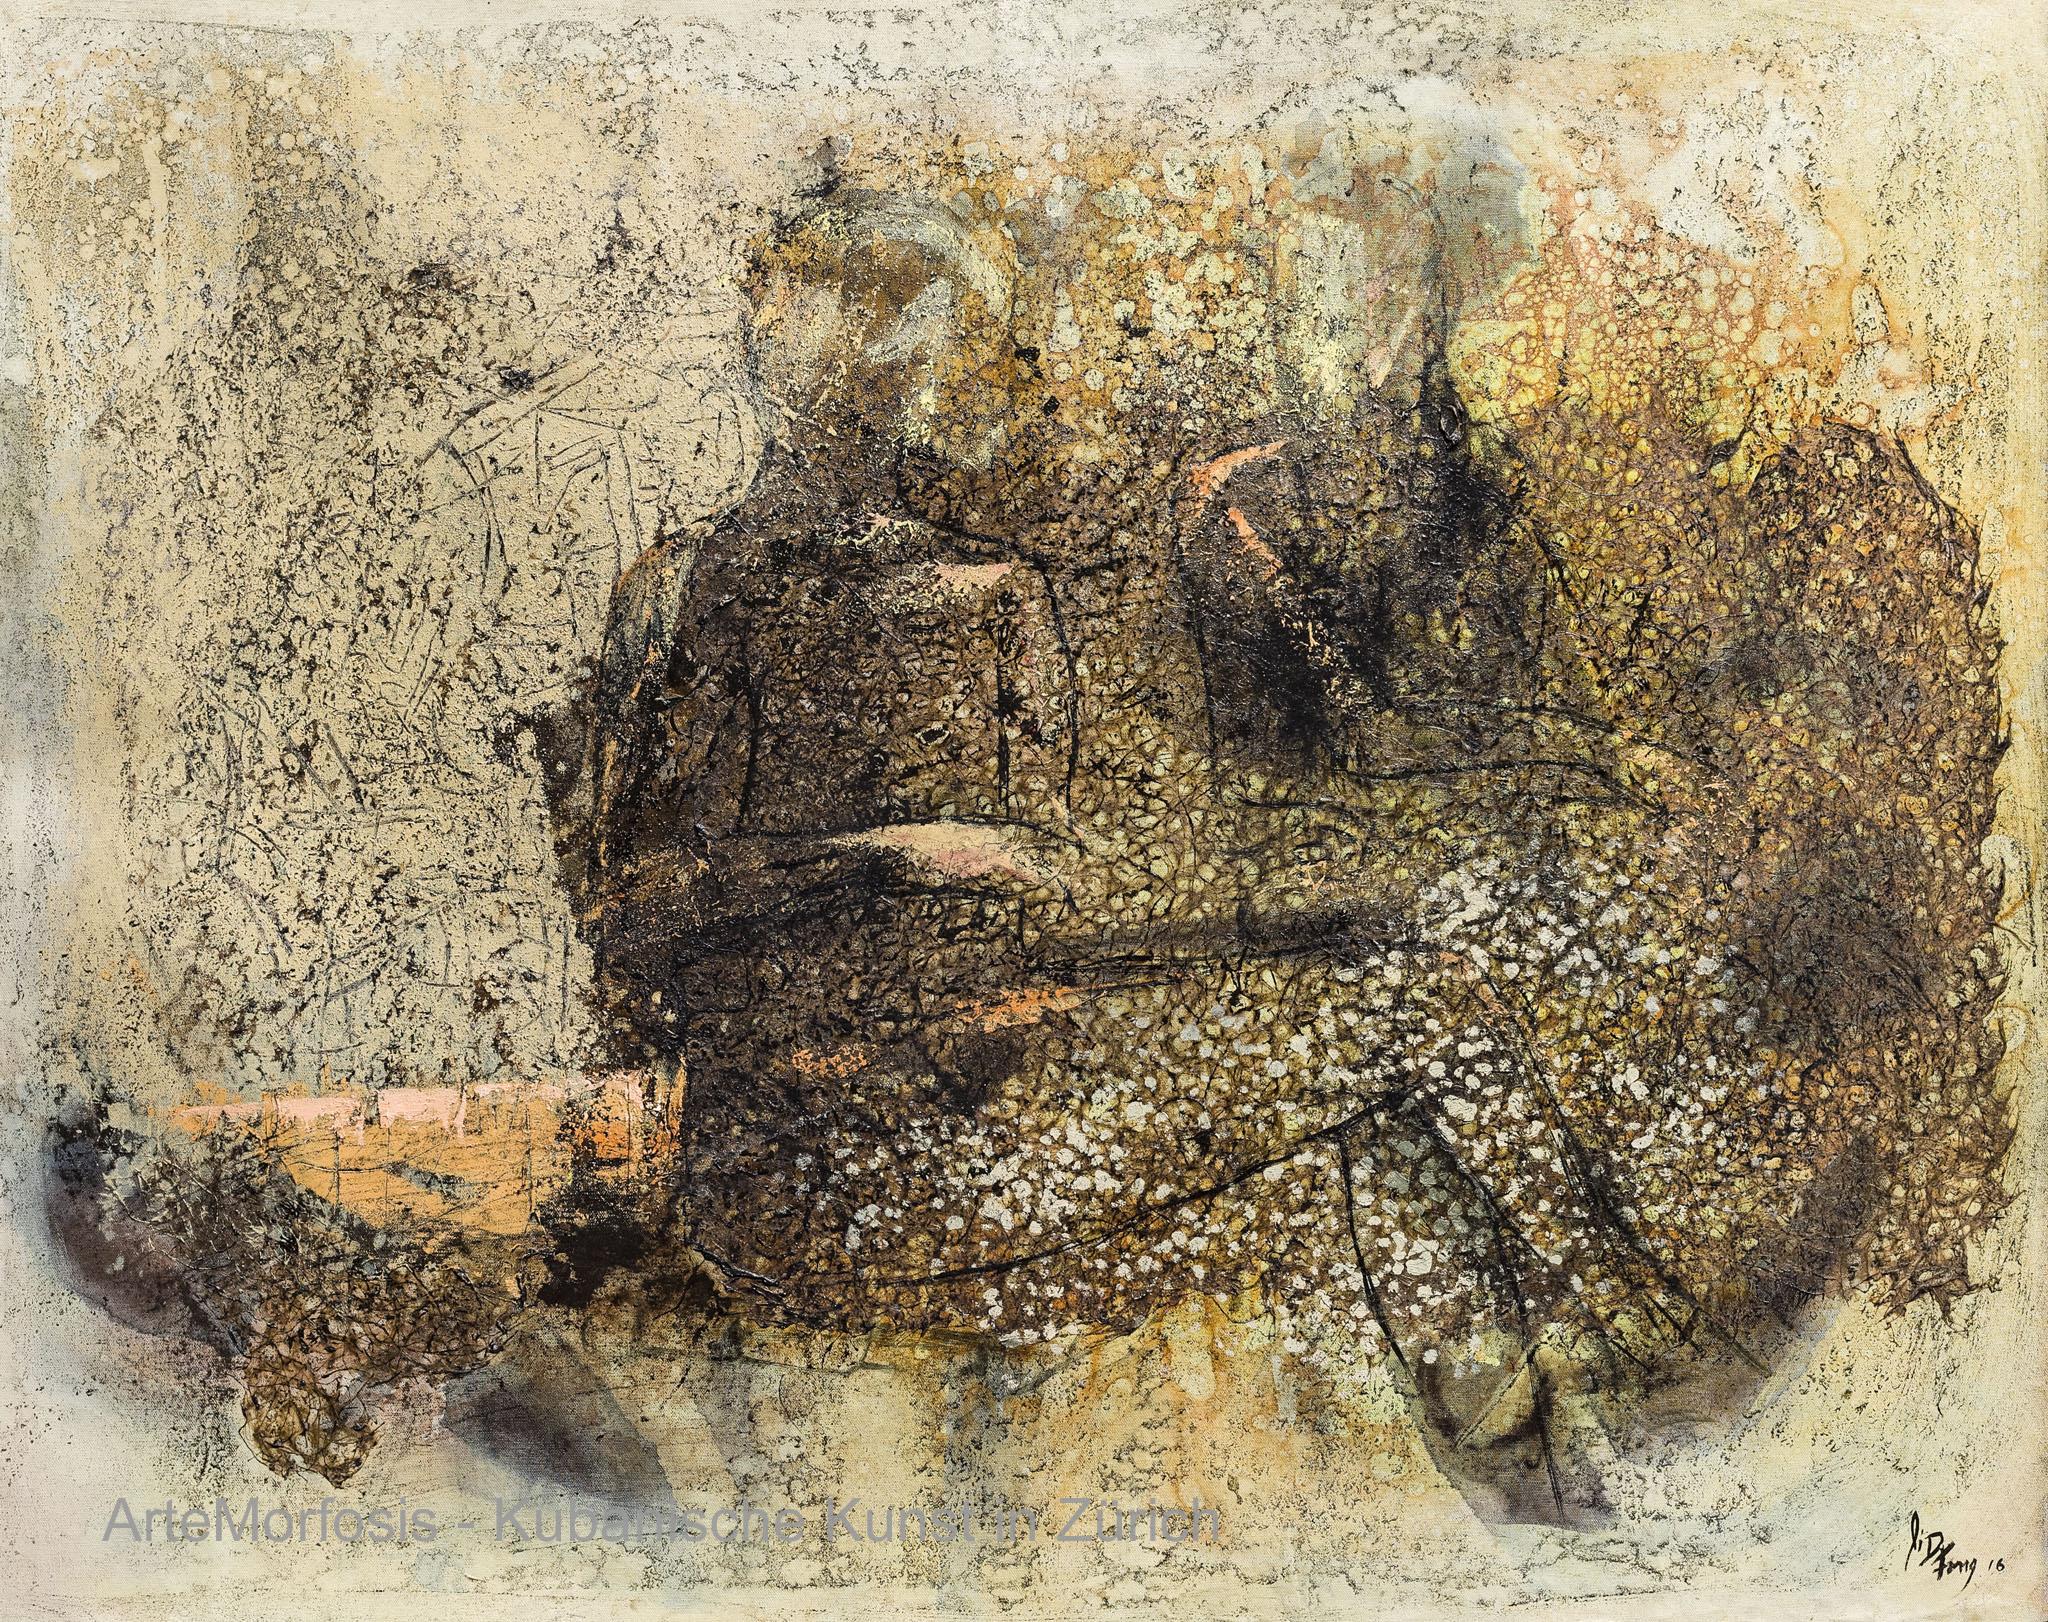 Li D Fong: Hablando de ilusion / Talking about Illusion / Mixed on Canvas - 2016 - 91 x 117 cm